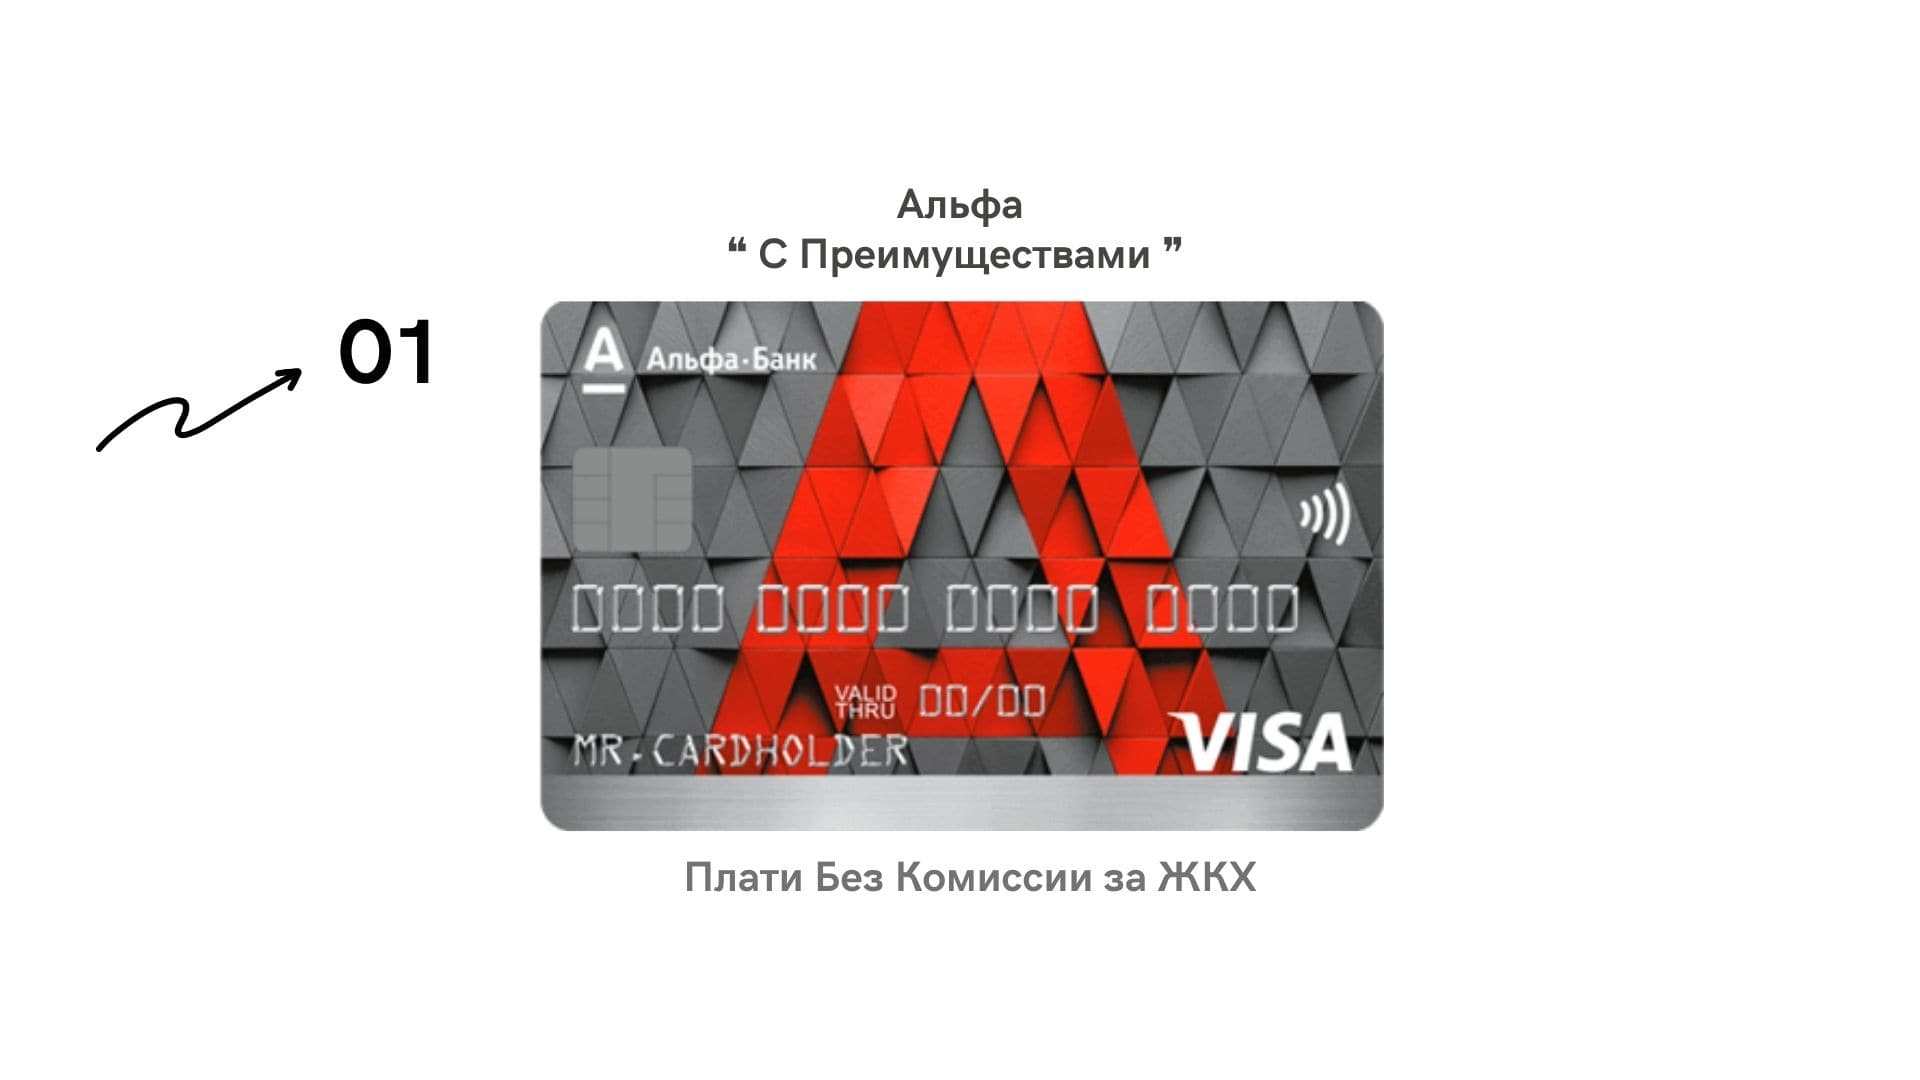 альфа банк оплата жкх без комиссии